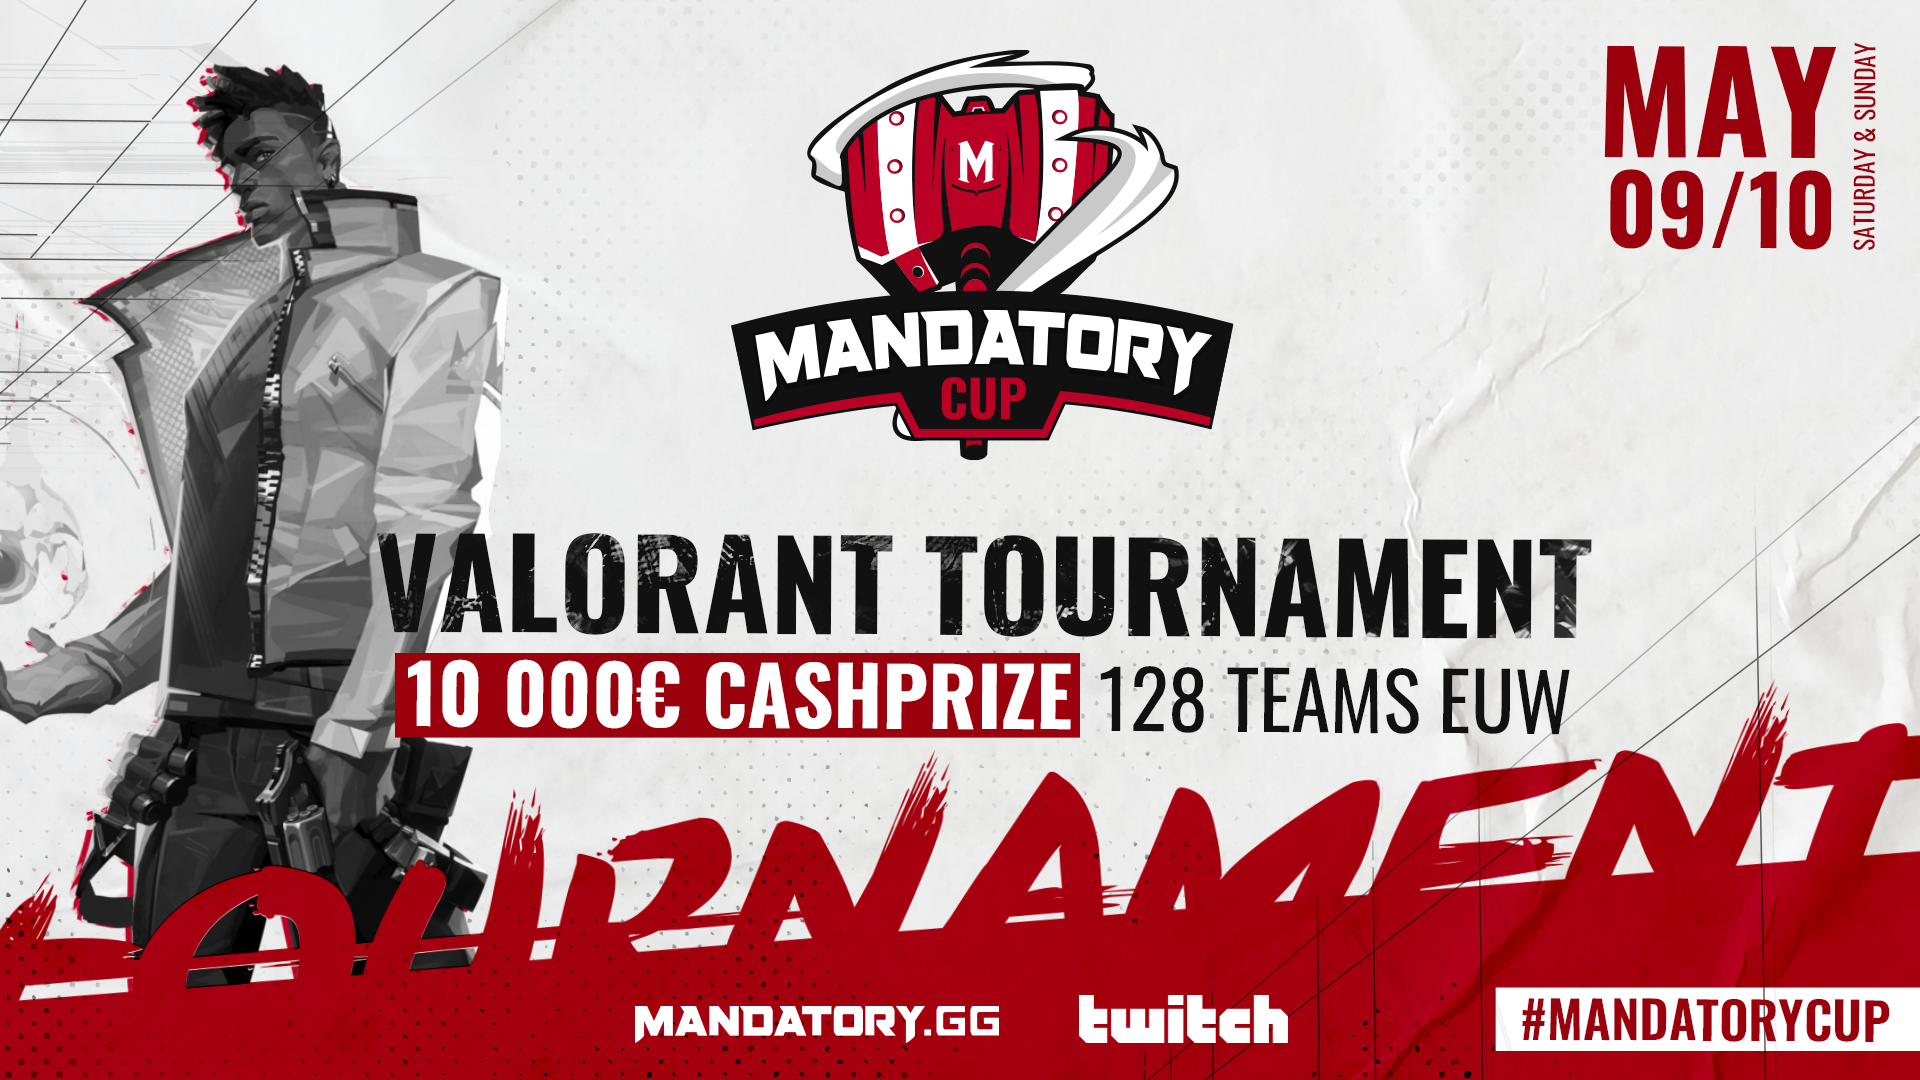 valorant-mandatorycup-tournament